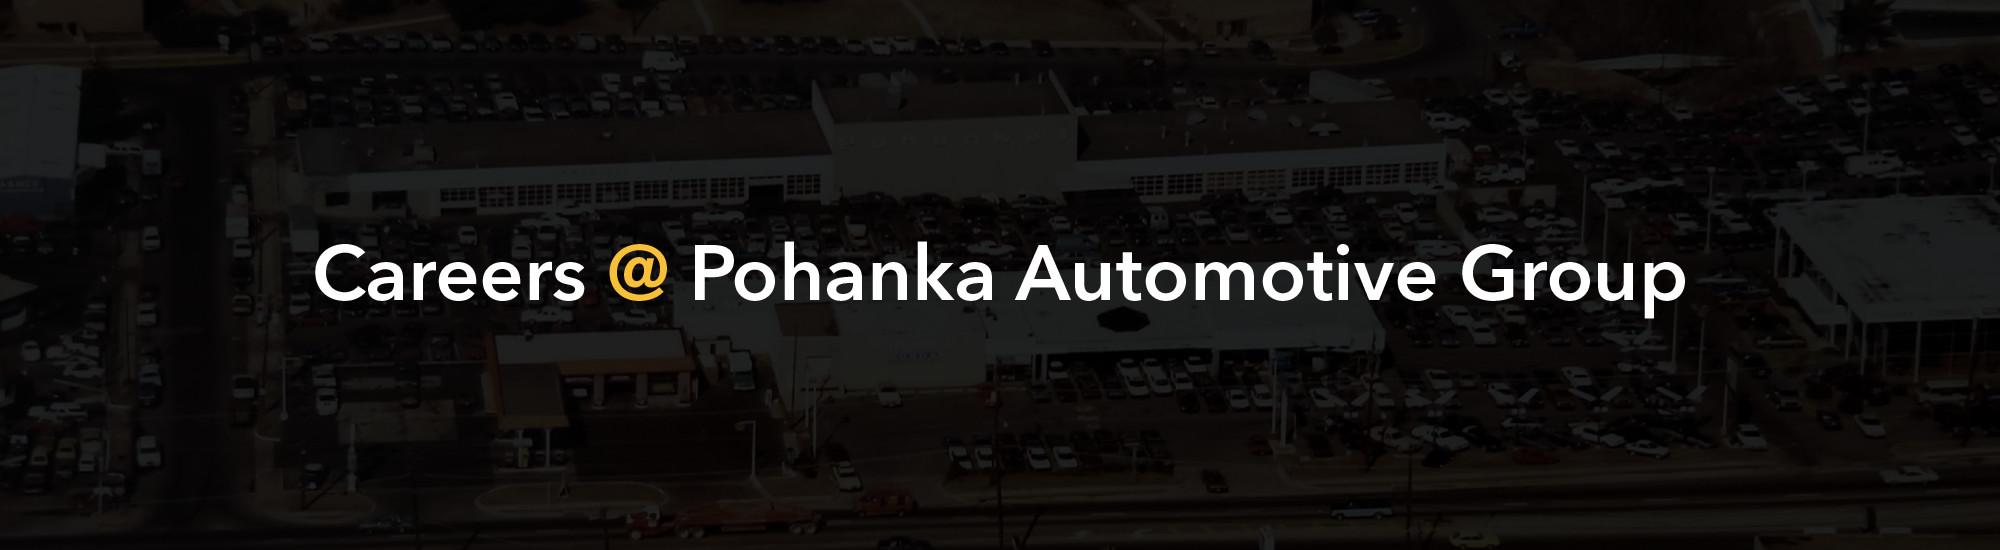 Careers At Pohanka Automotive Group